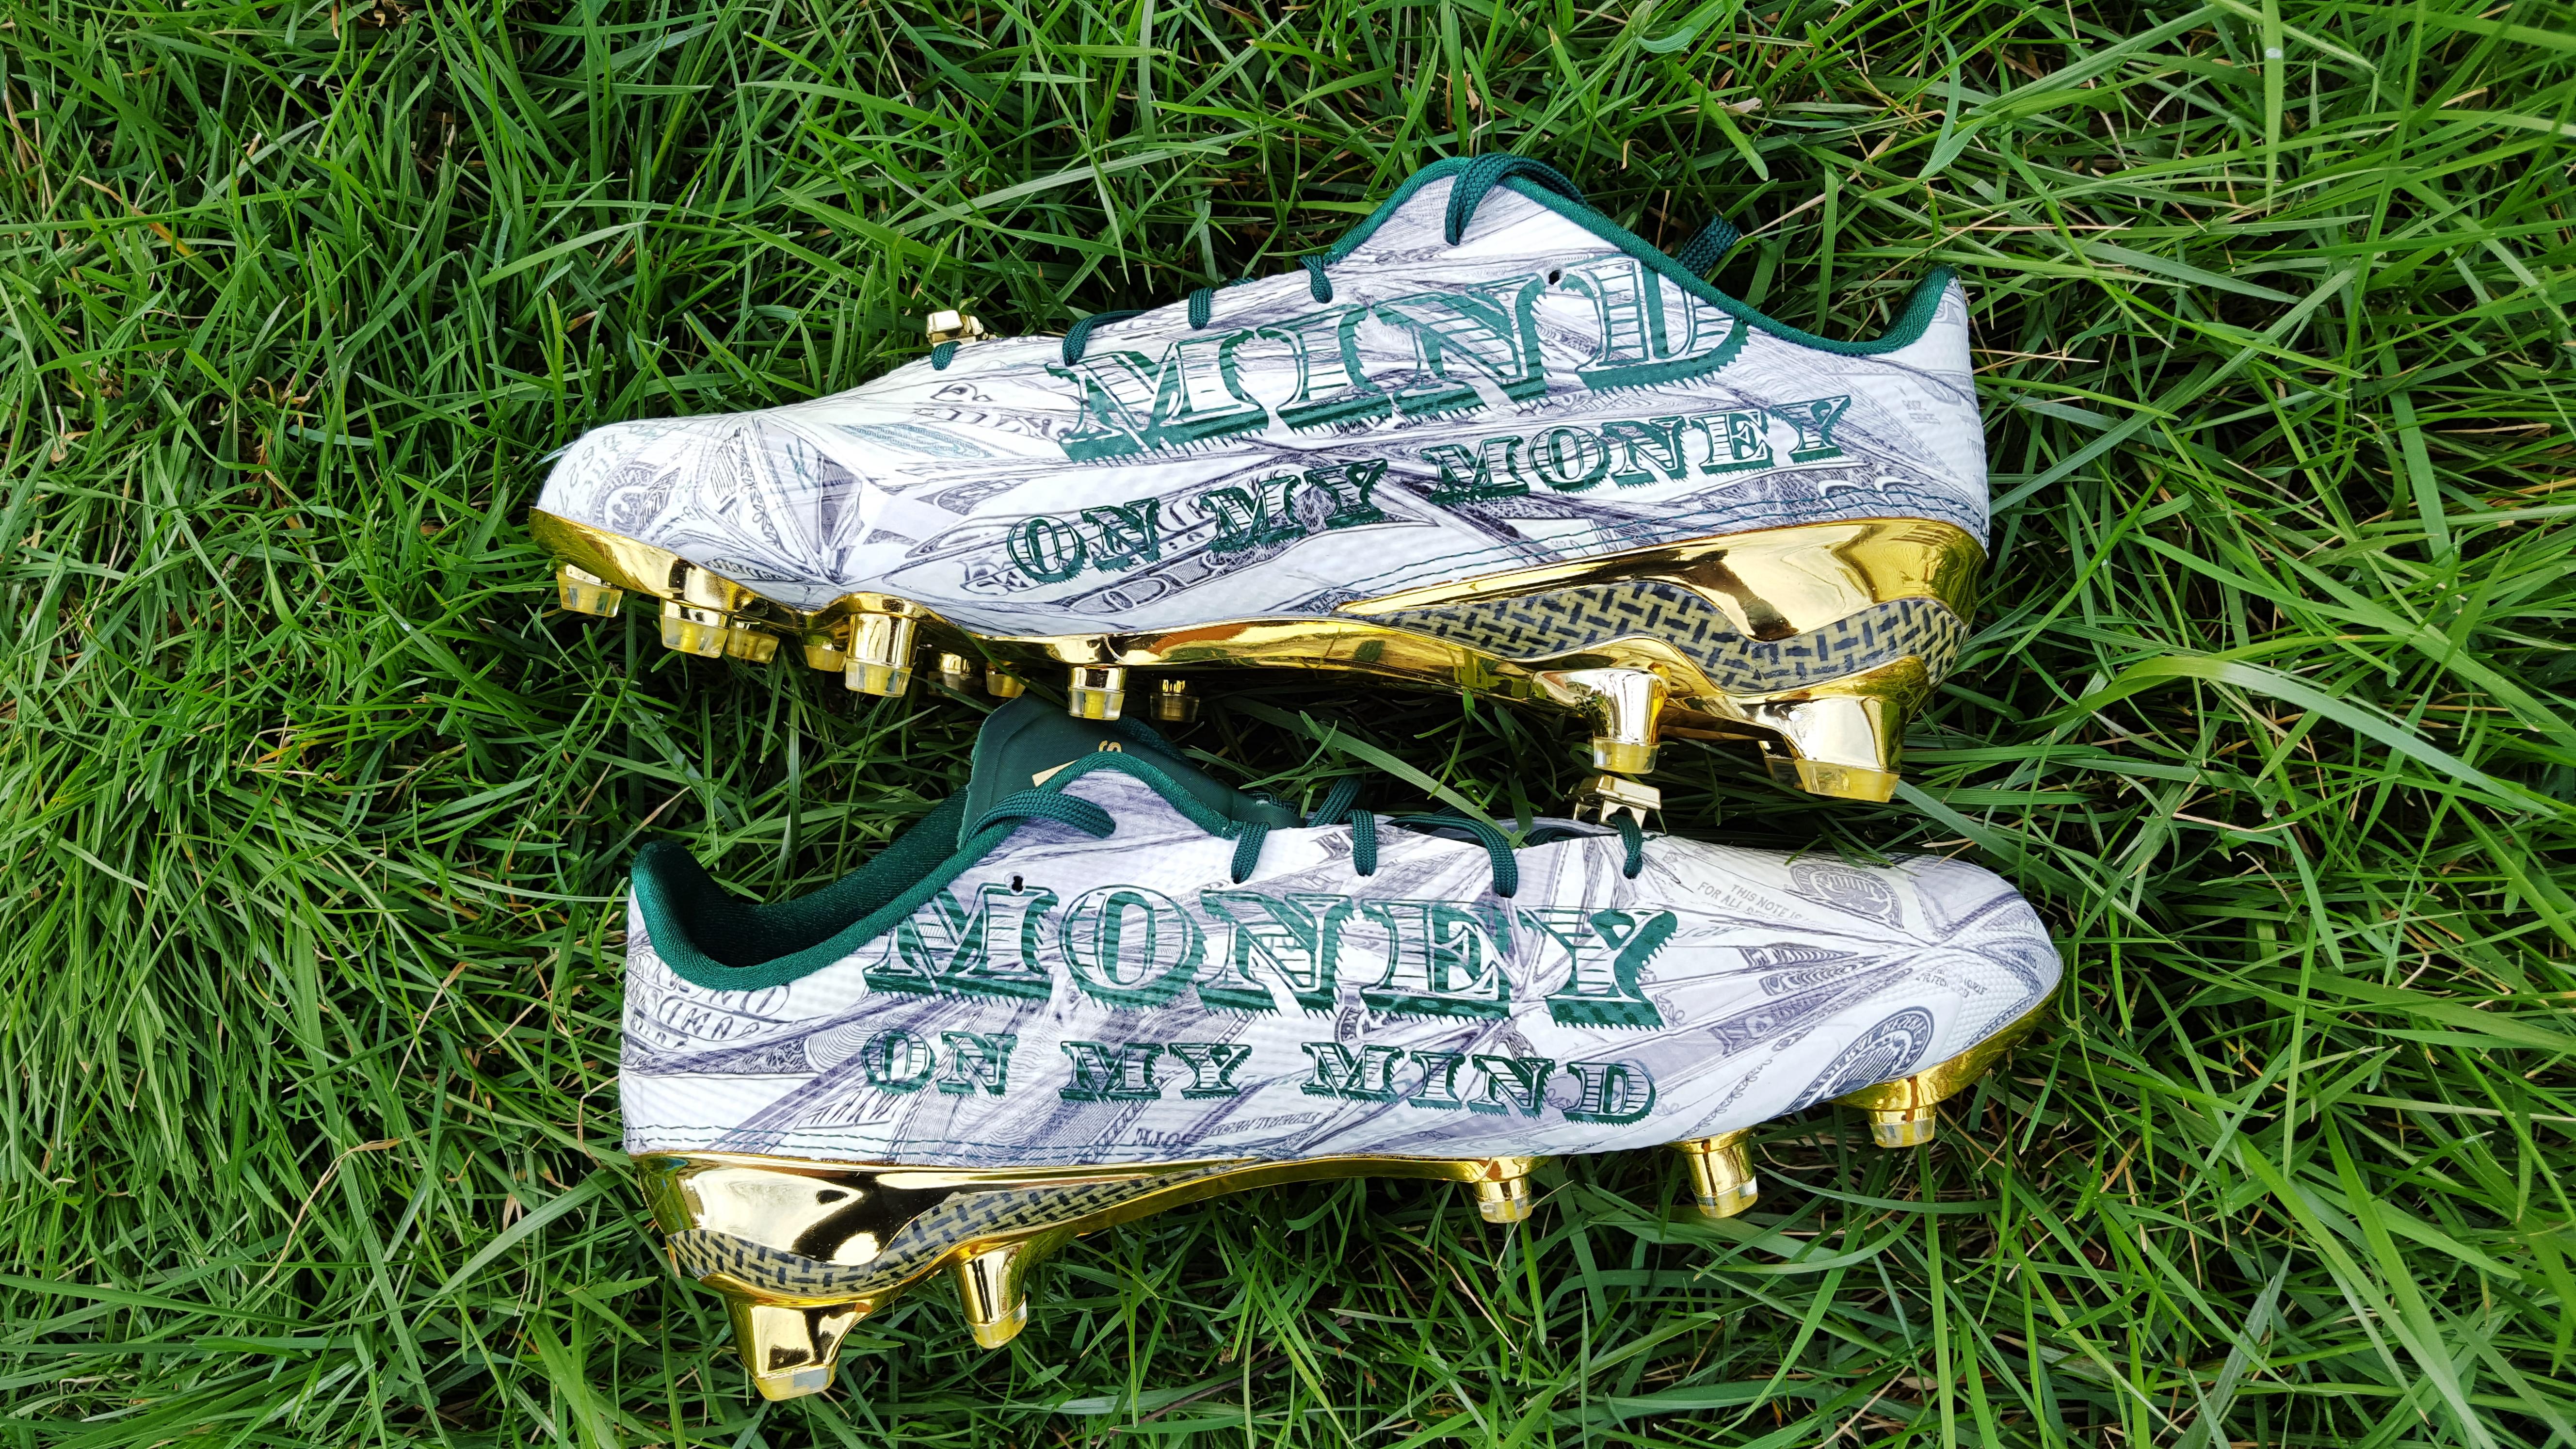 5cb0c7ee2ad4 Look Closer presents... adidas adizero 5-Star 5.0 Snoop Money Cleat -  Hardwood and Hollywood